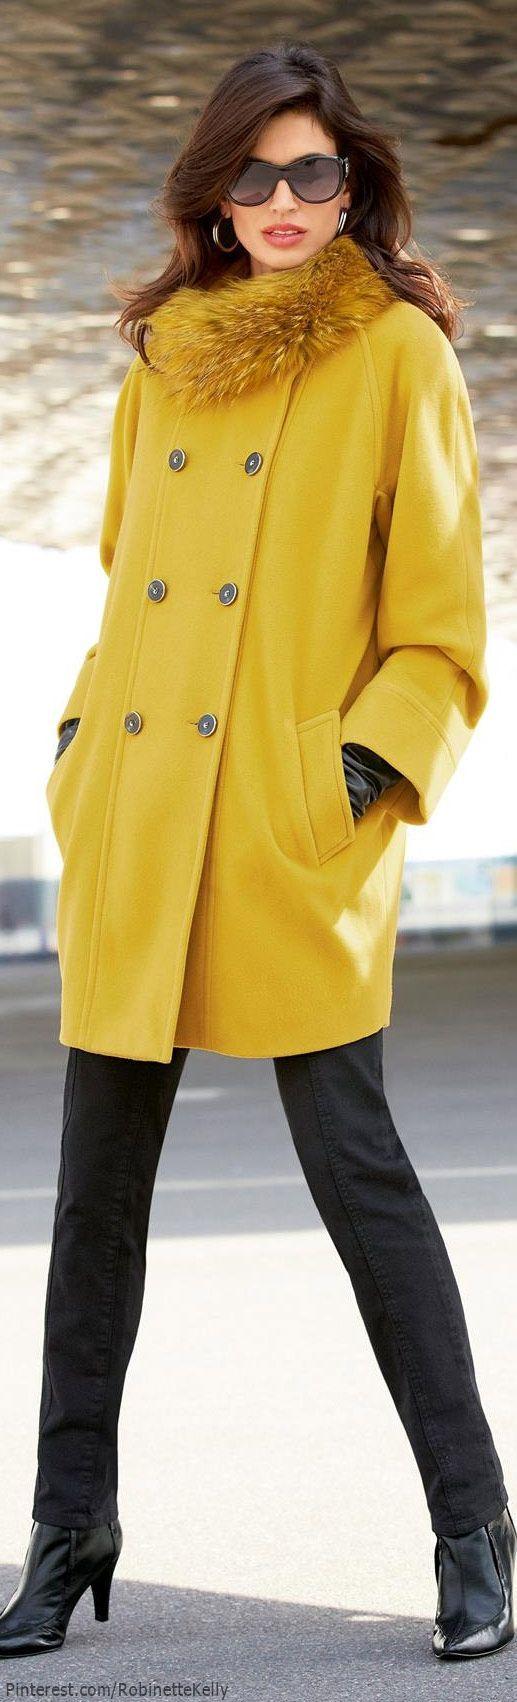 Cool Weather Street Style | Madeleine: